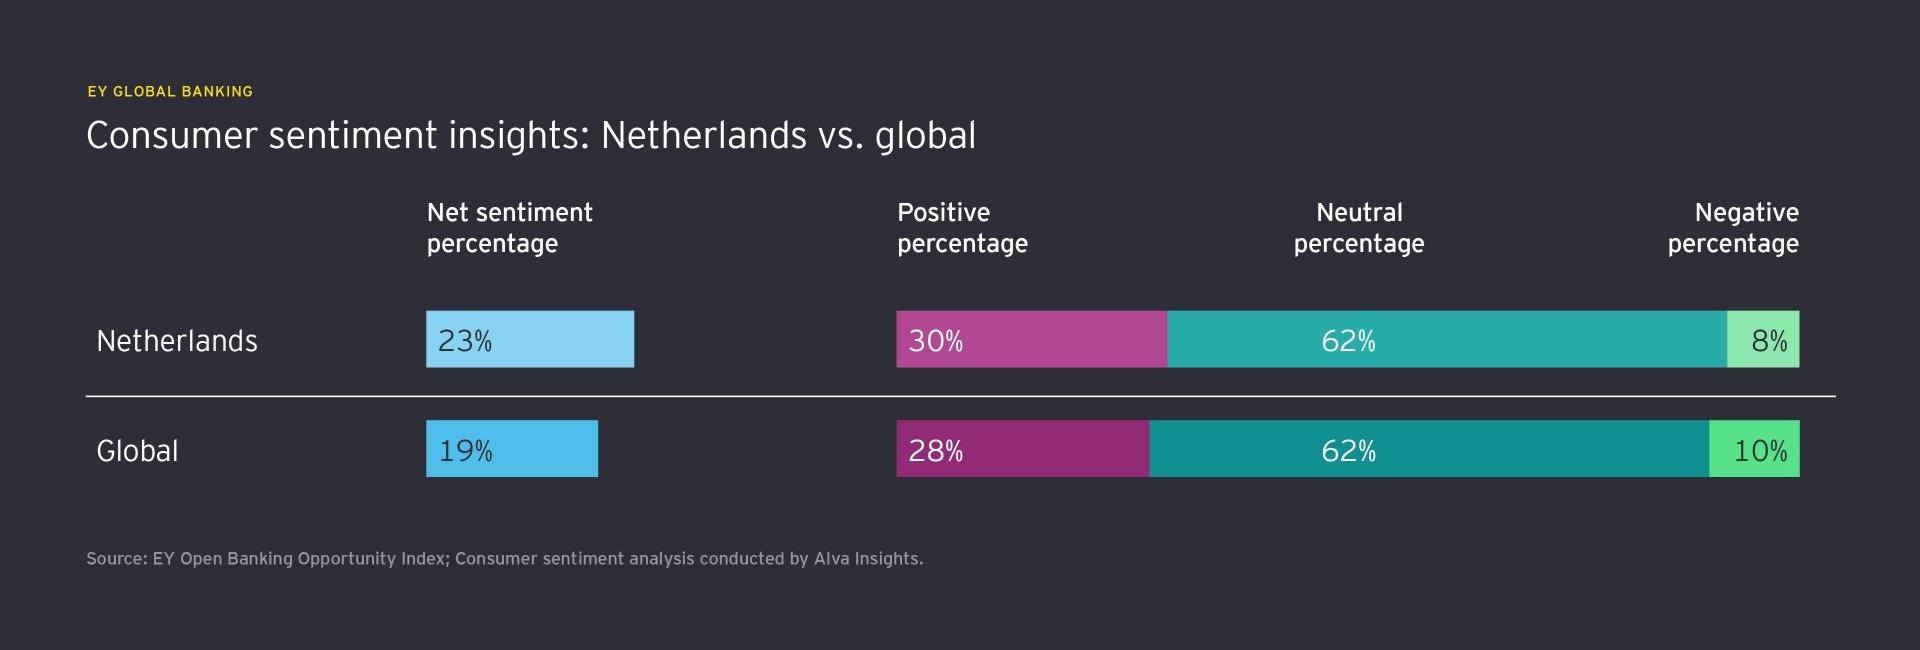 consumer sentiment insights netherlands